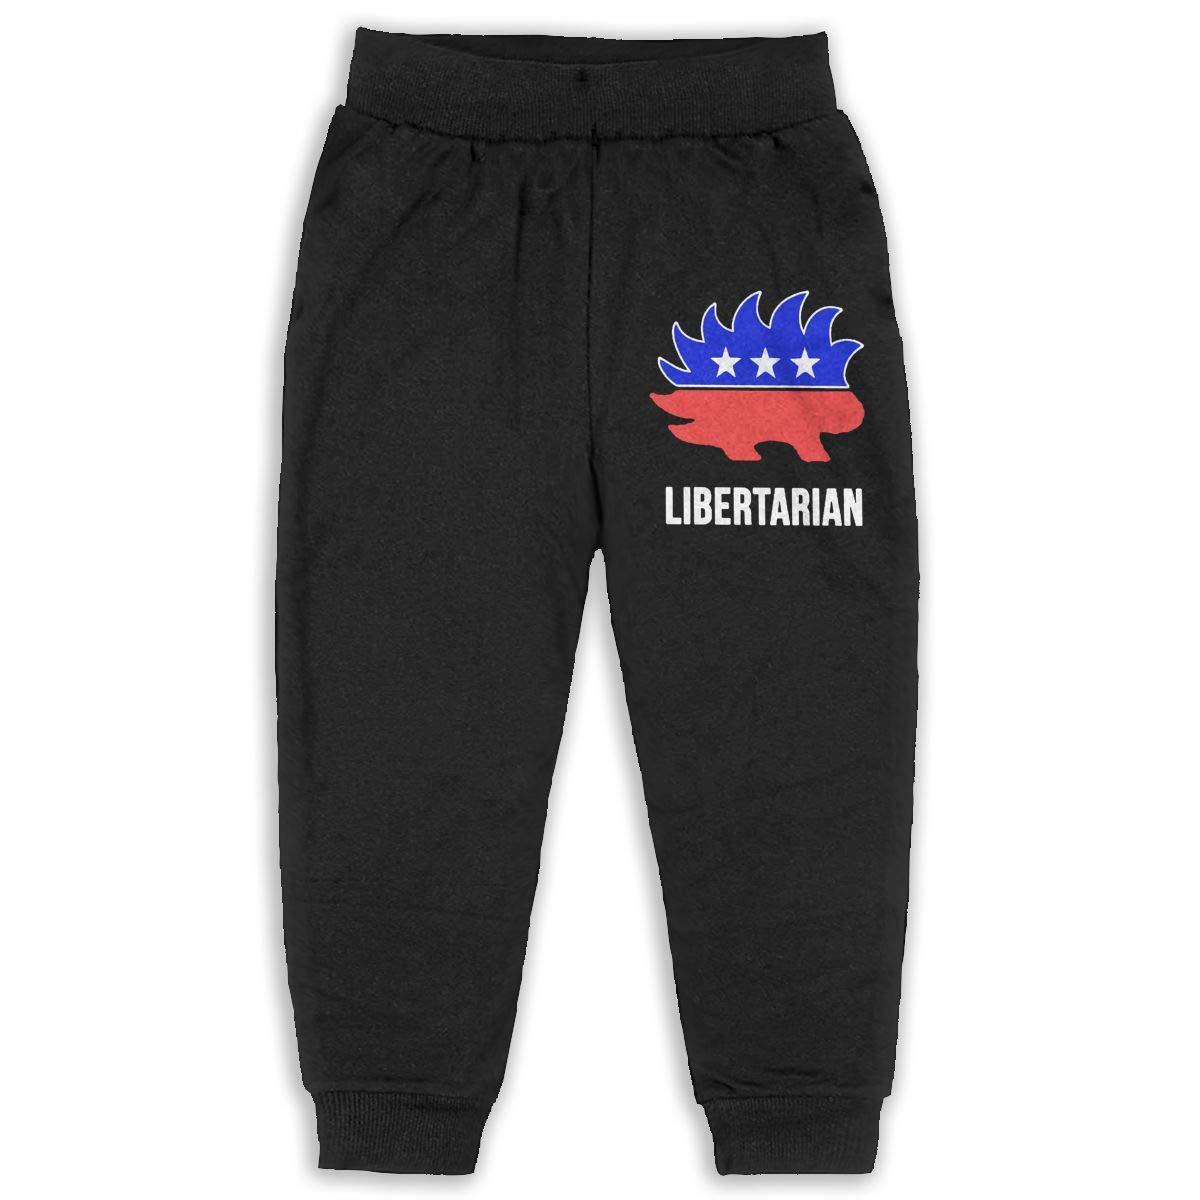 Fleece Active Joggers Elastic Pants DaXi1 Libertarian Porcupine Hedging Sweatpants for Boys /& Girls